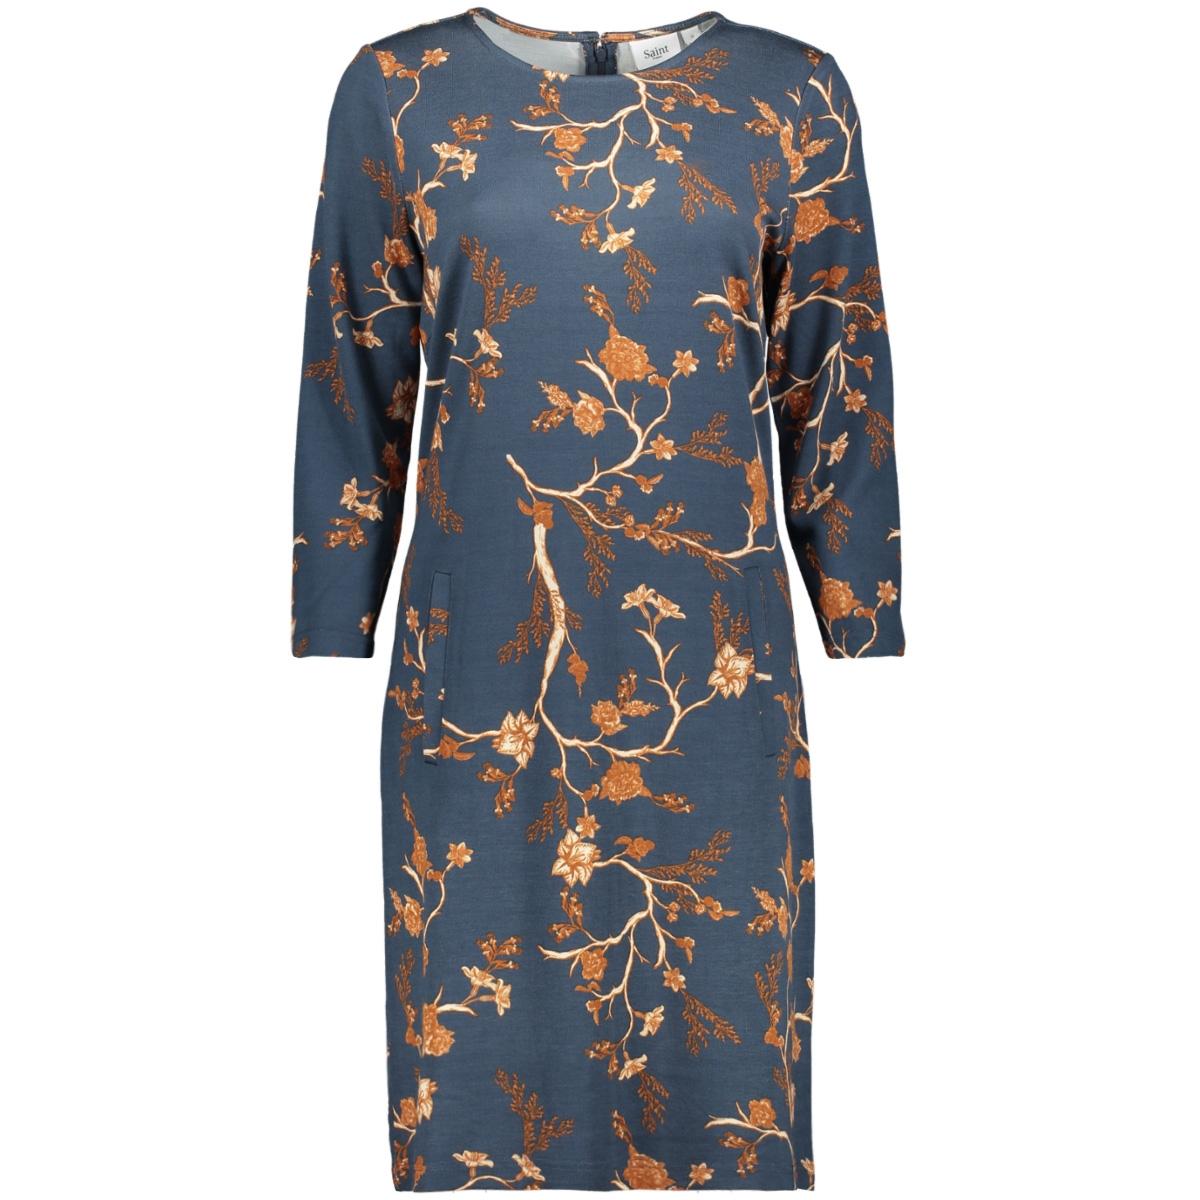 jersey dress u6543 saint tropez jurk 9263